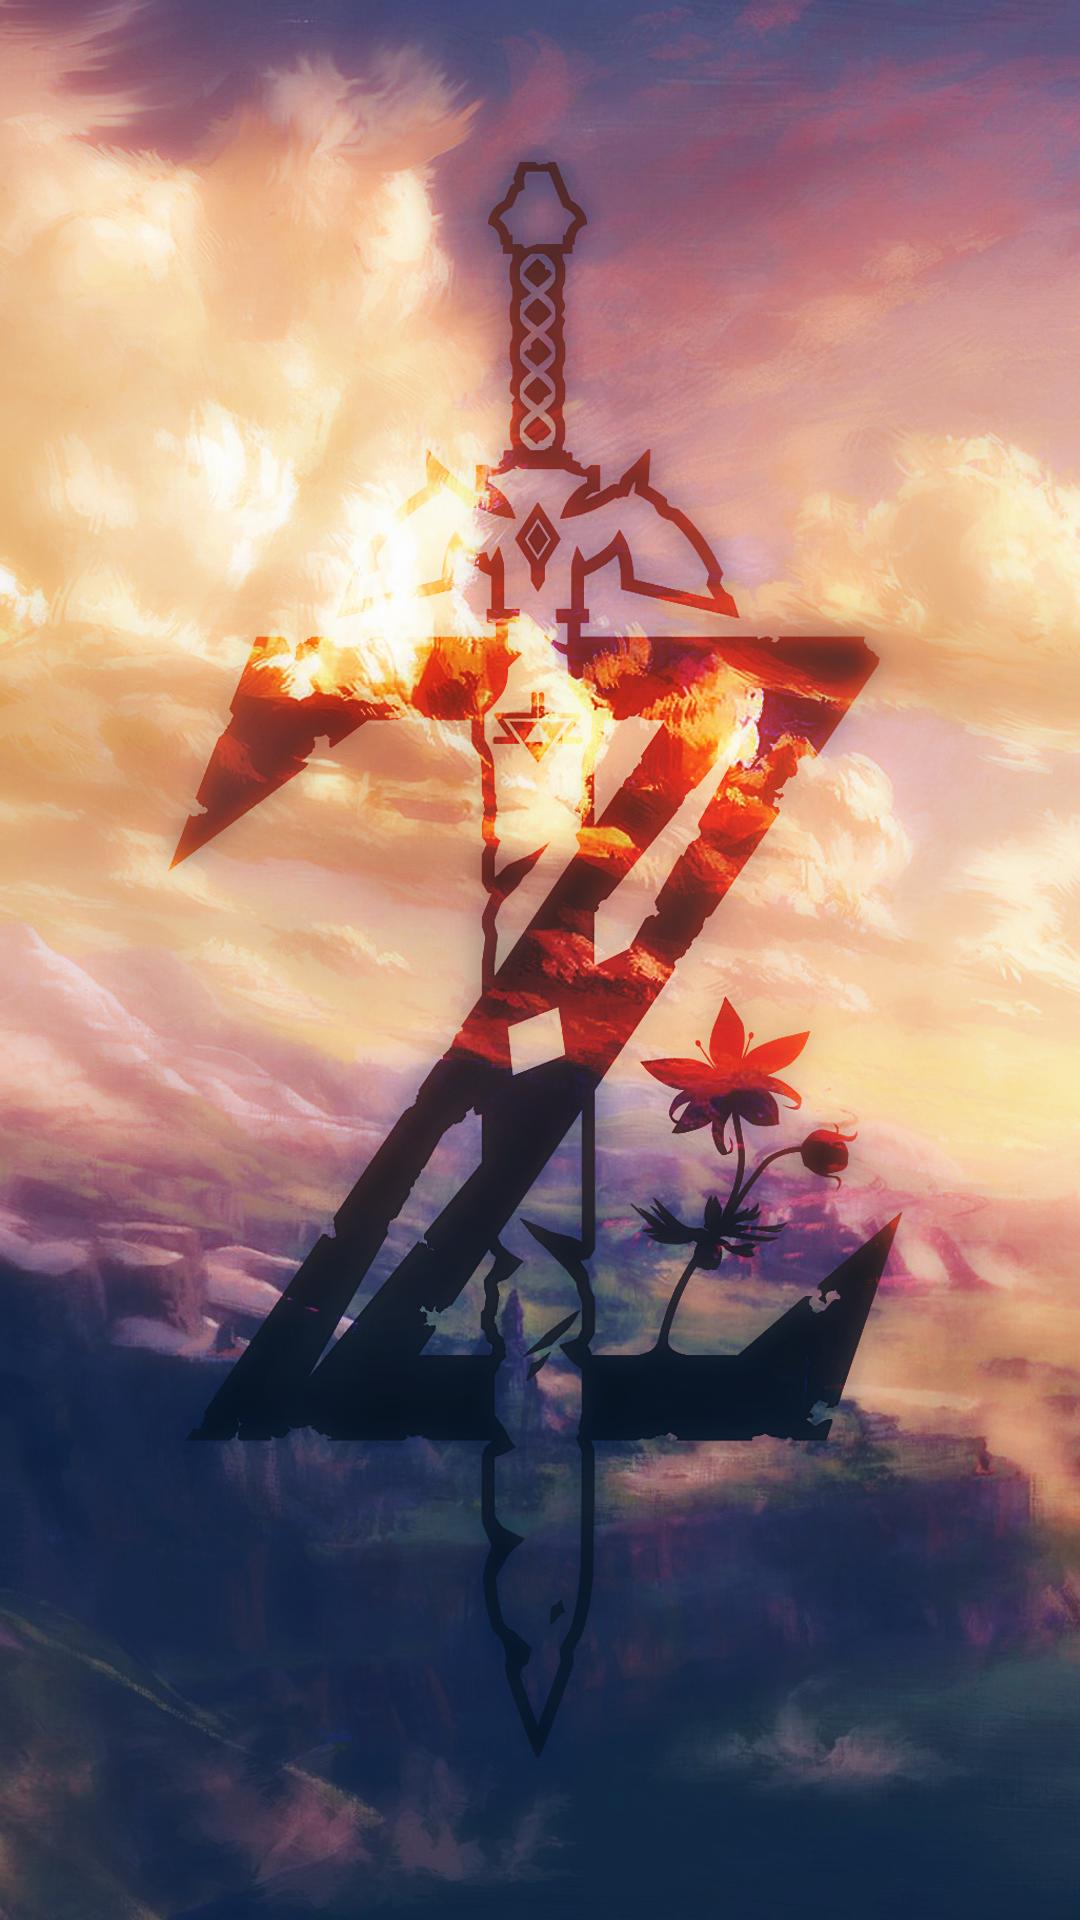 Pin by Zuné Pallister on Legend of Zelda BOTW Legend of